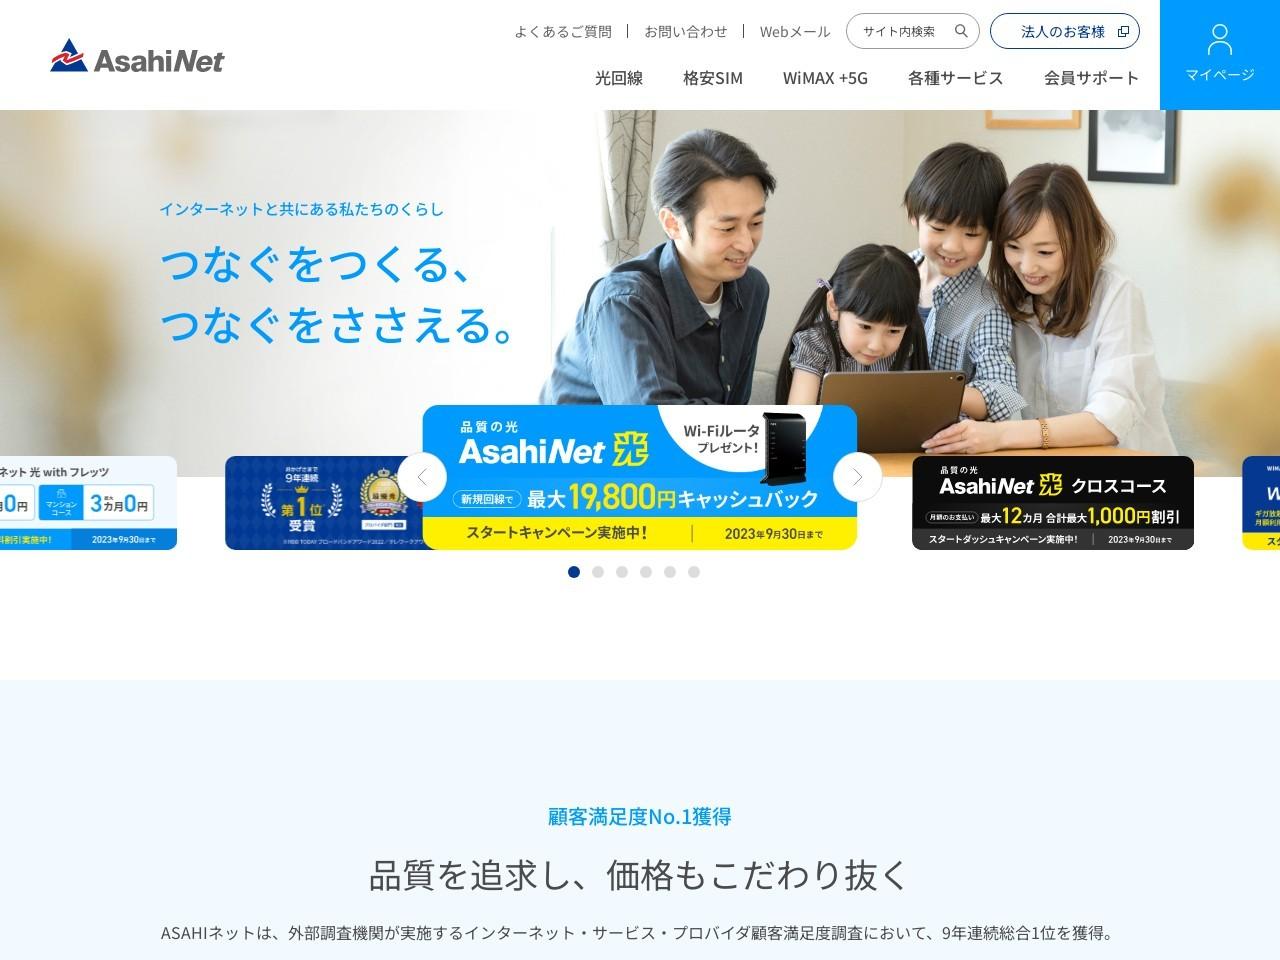 http://www.ne.jp/asahi/nagomi/moon/